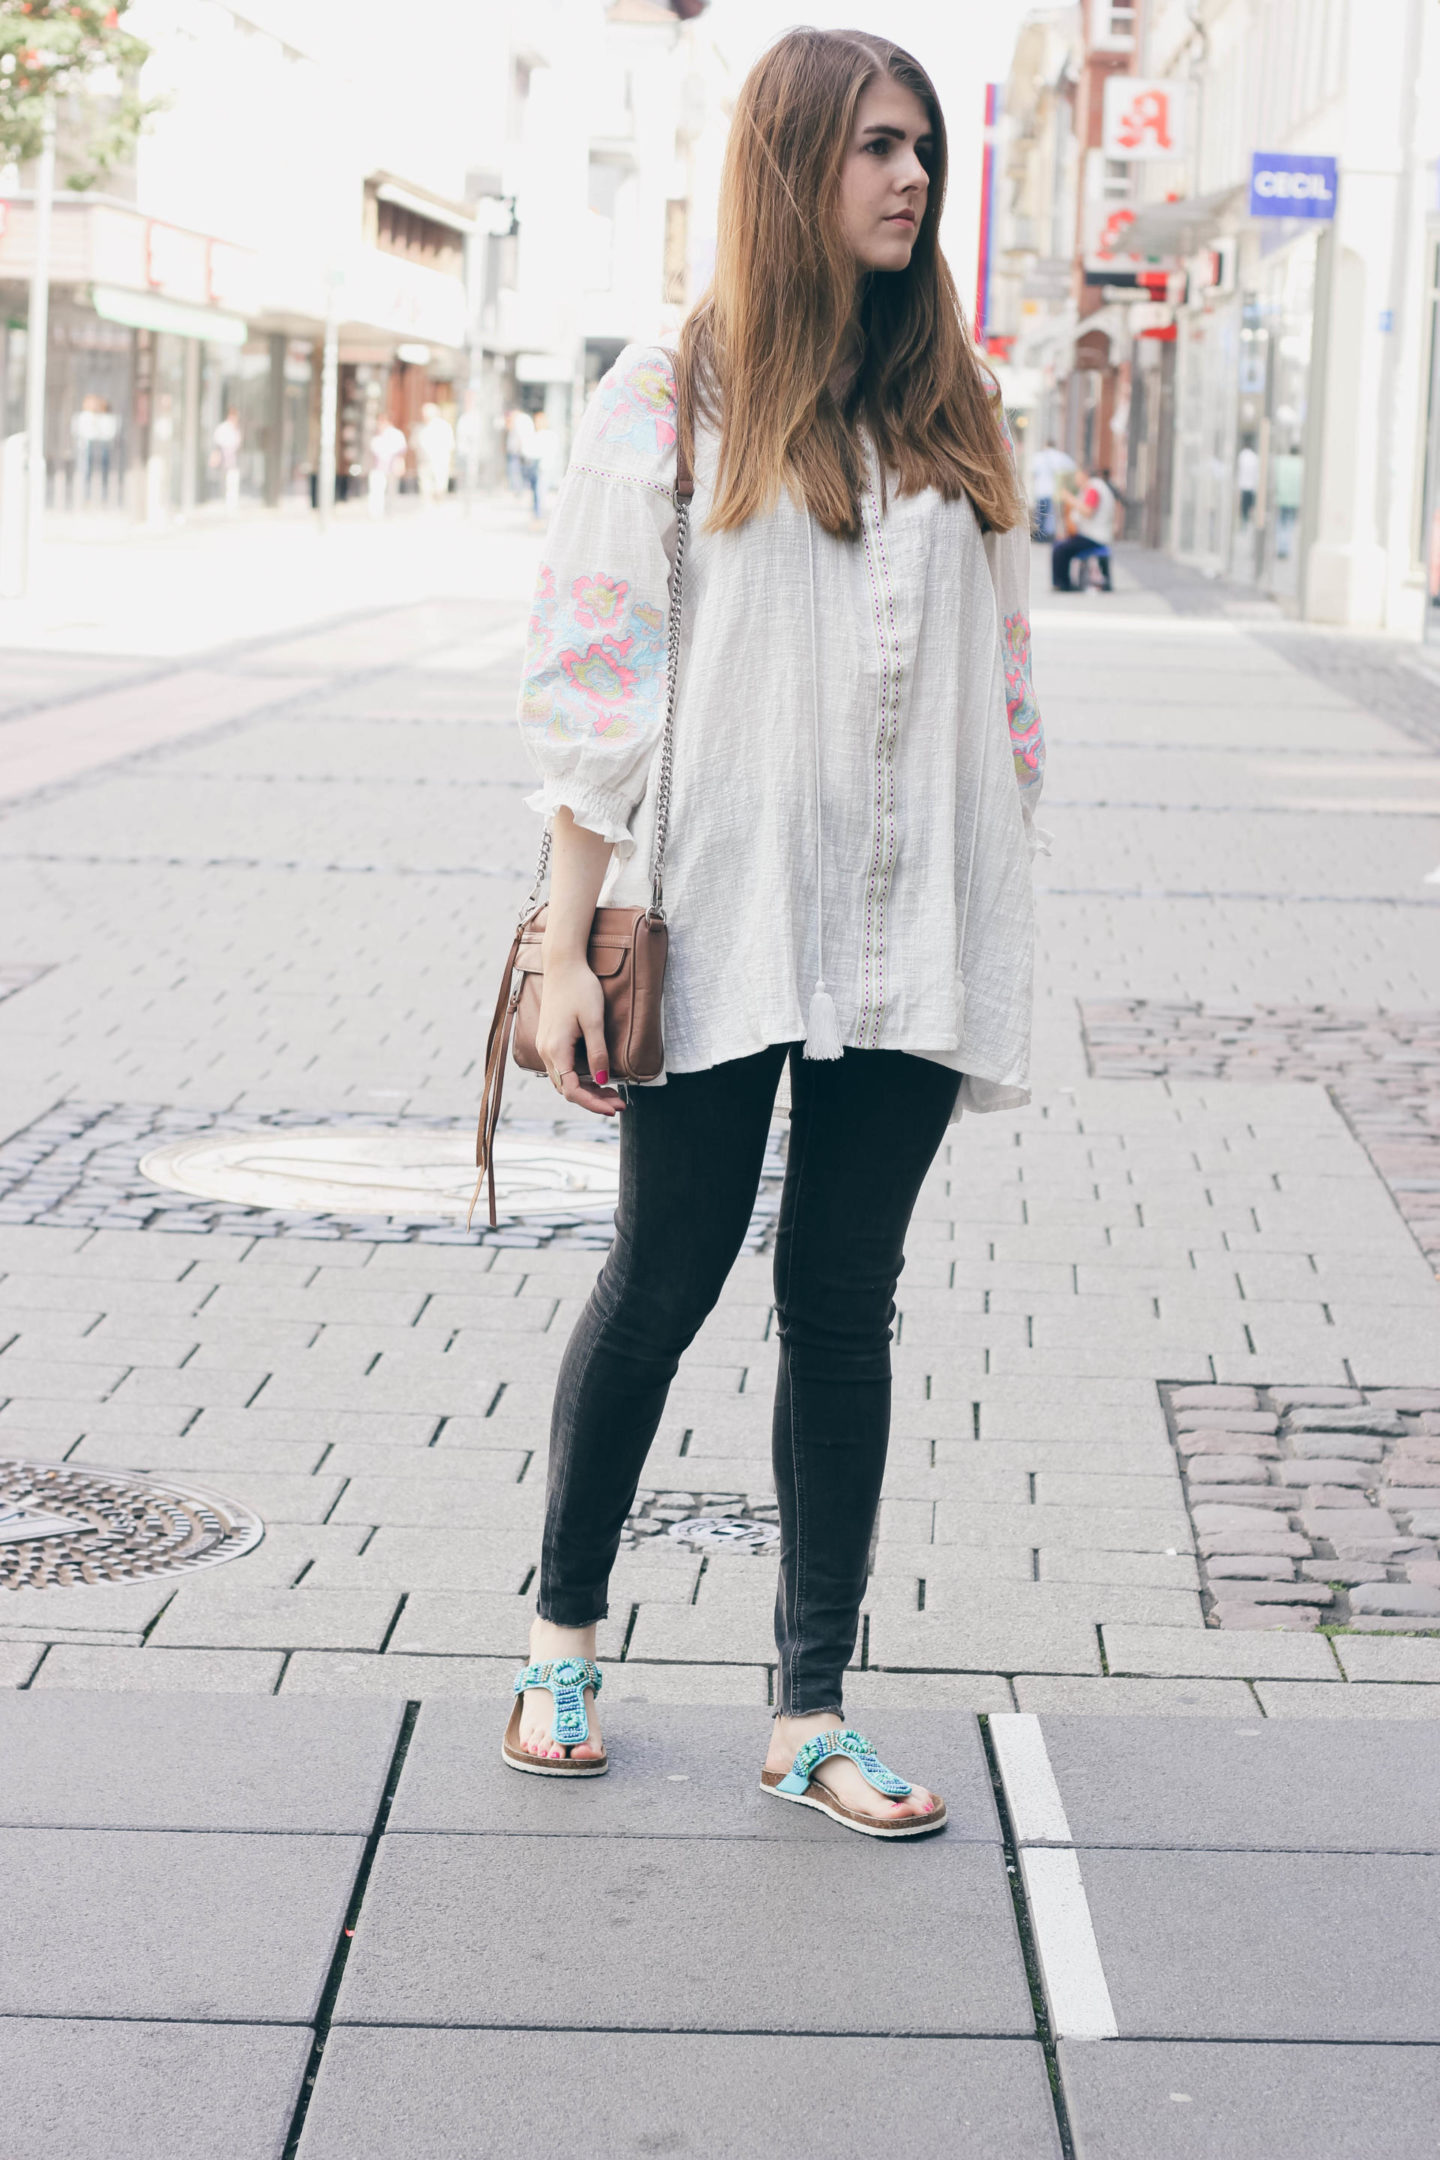 modische Muster klassisch großer Abverkauf 1 Woche, 5 Outfits - Outfits of the Week - nilooorac